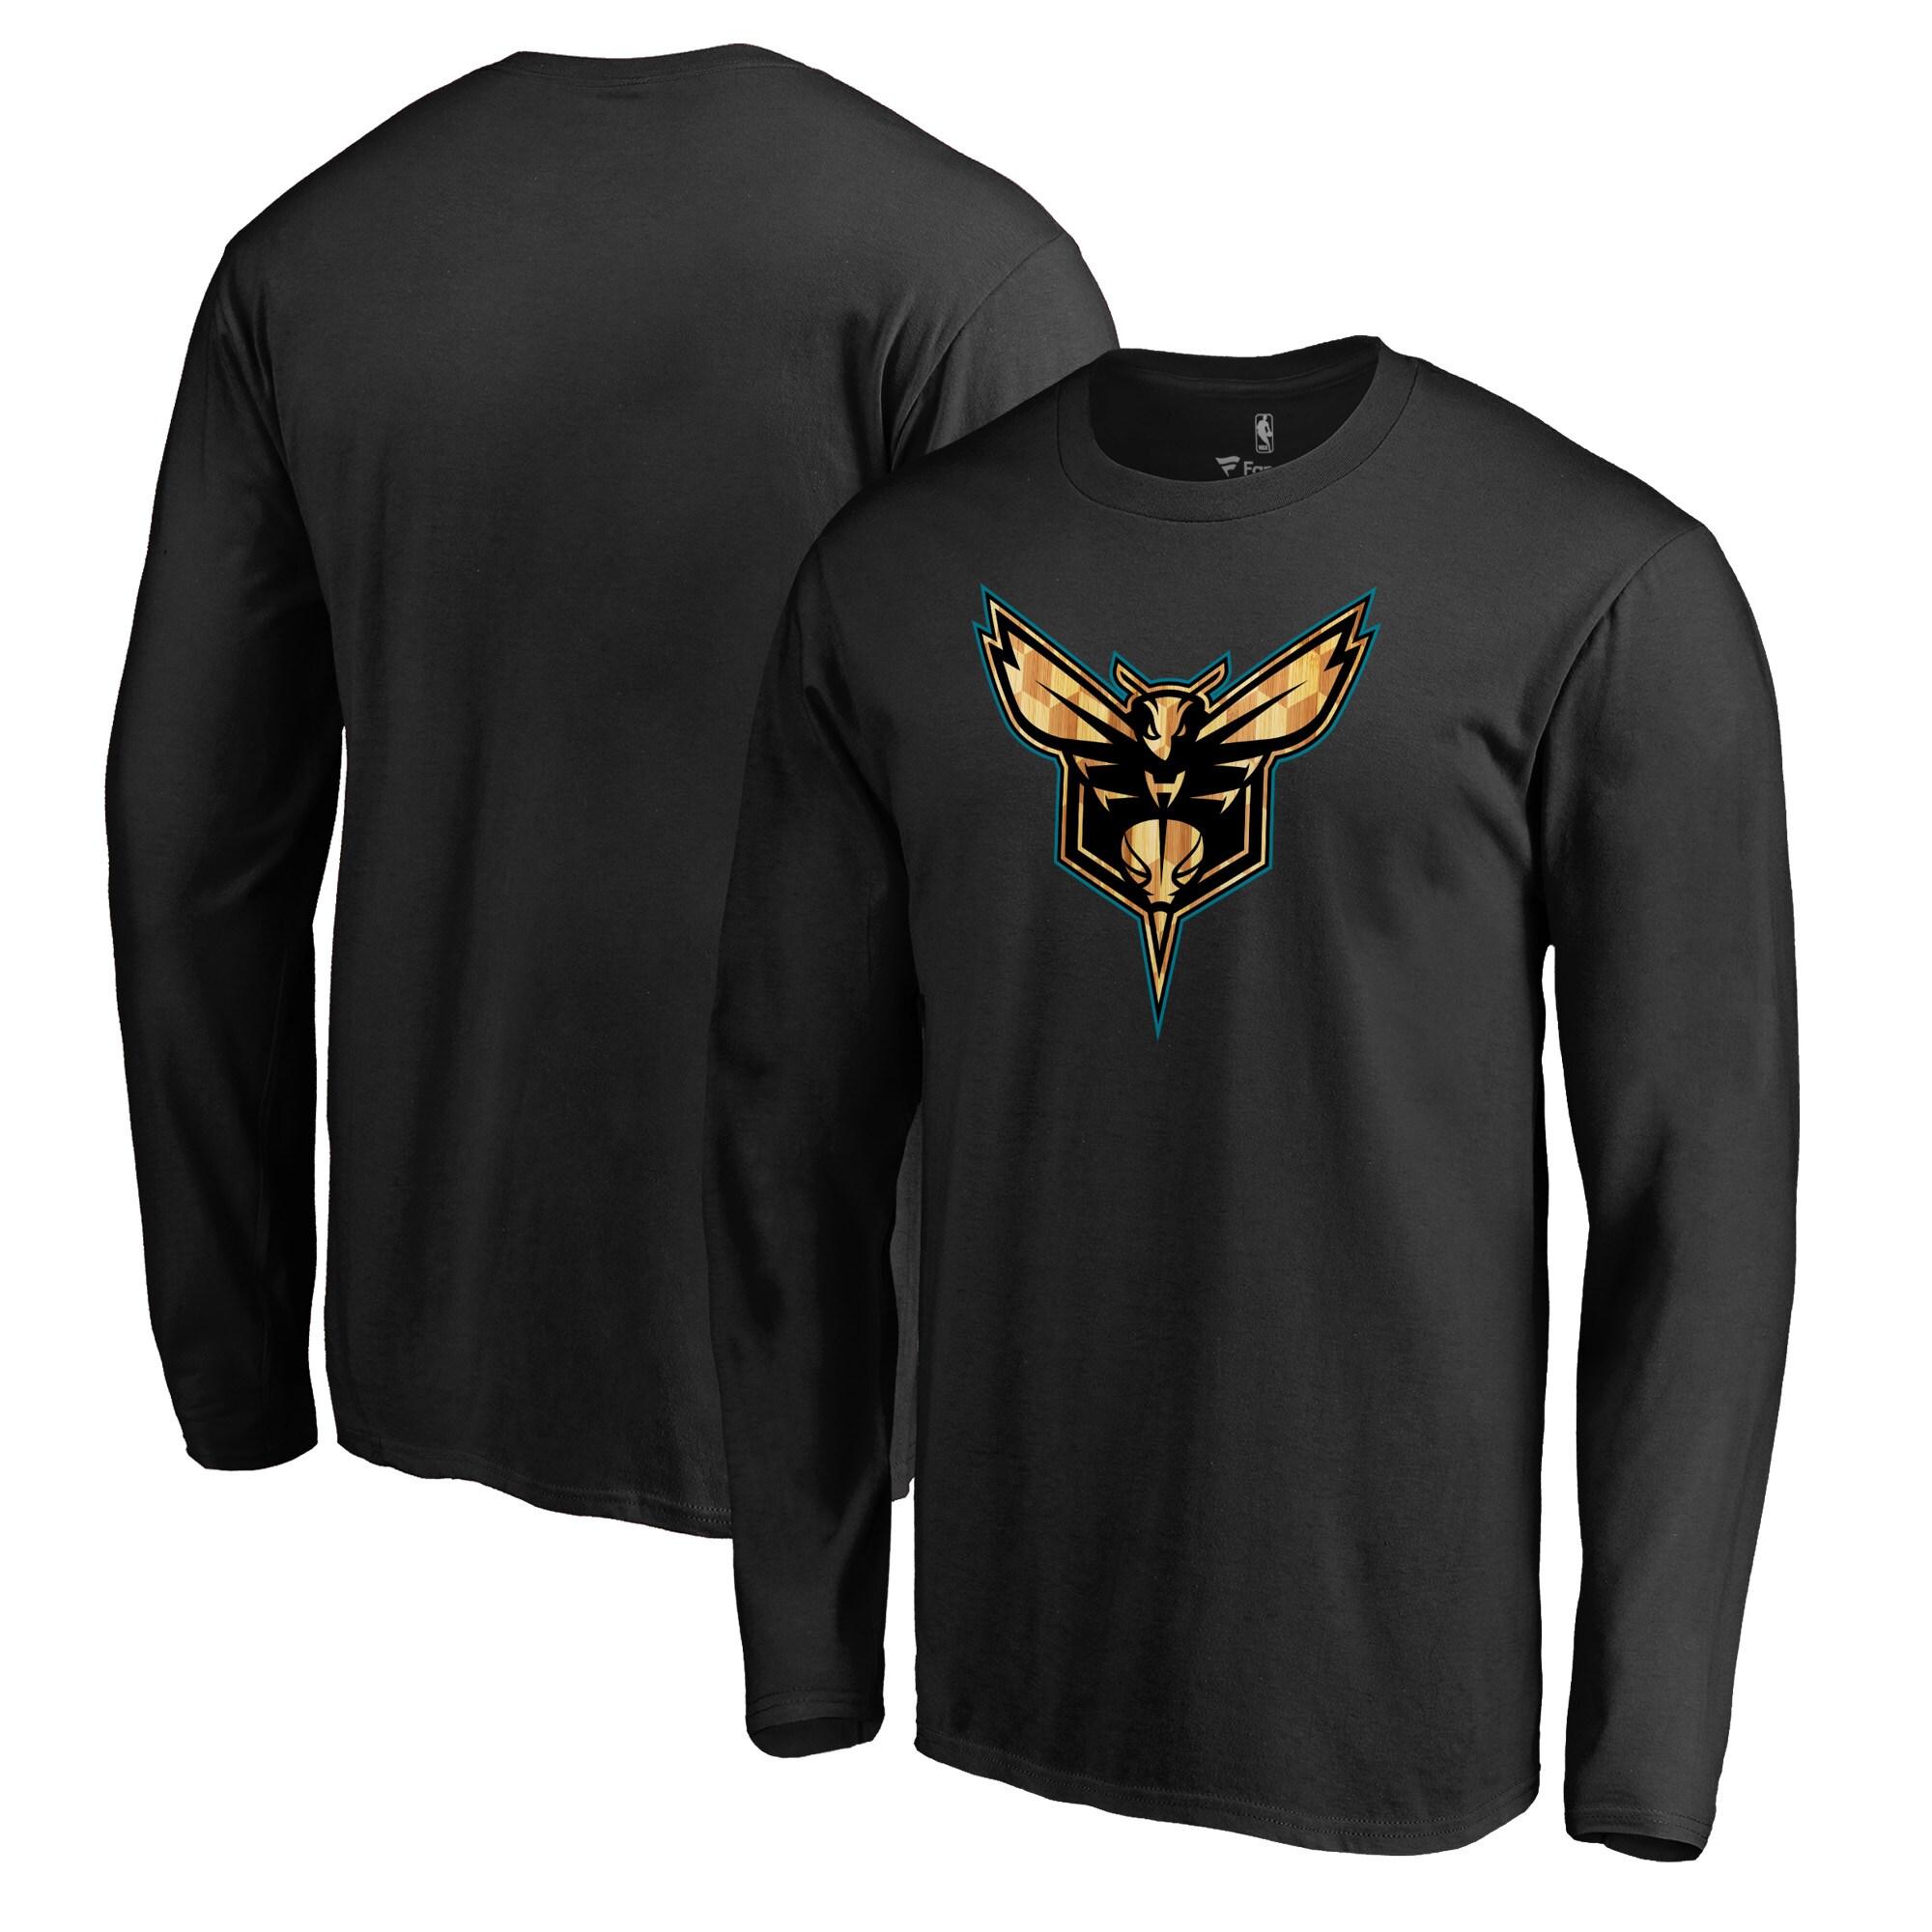 Charlotte Hornets Fanatics Branded Hardwood Big & Tall Long Sleeve T-Shirt - Black